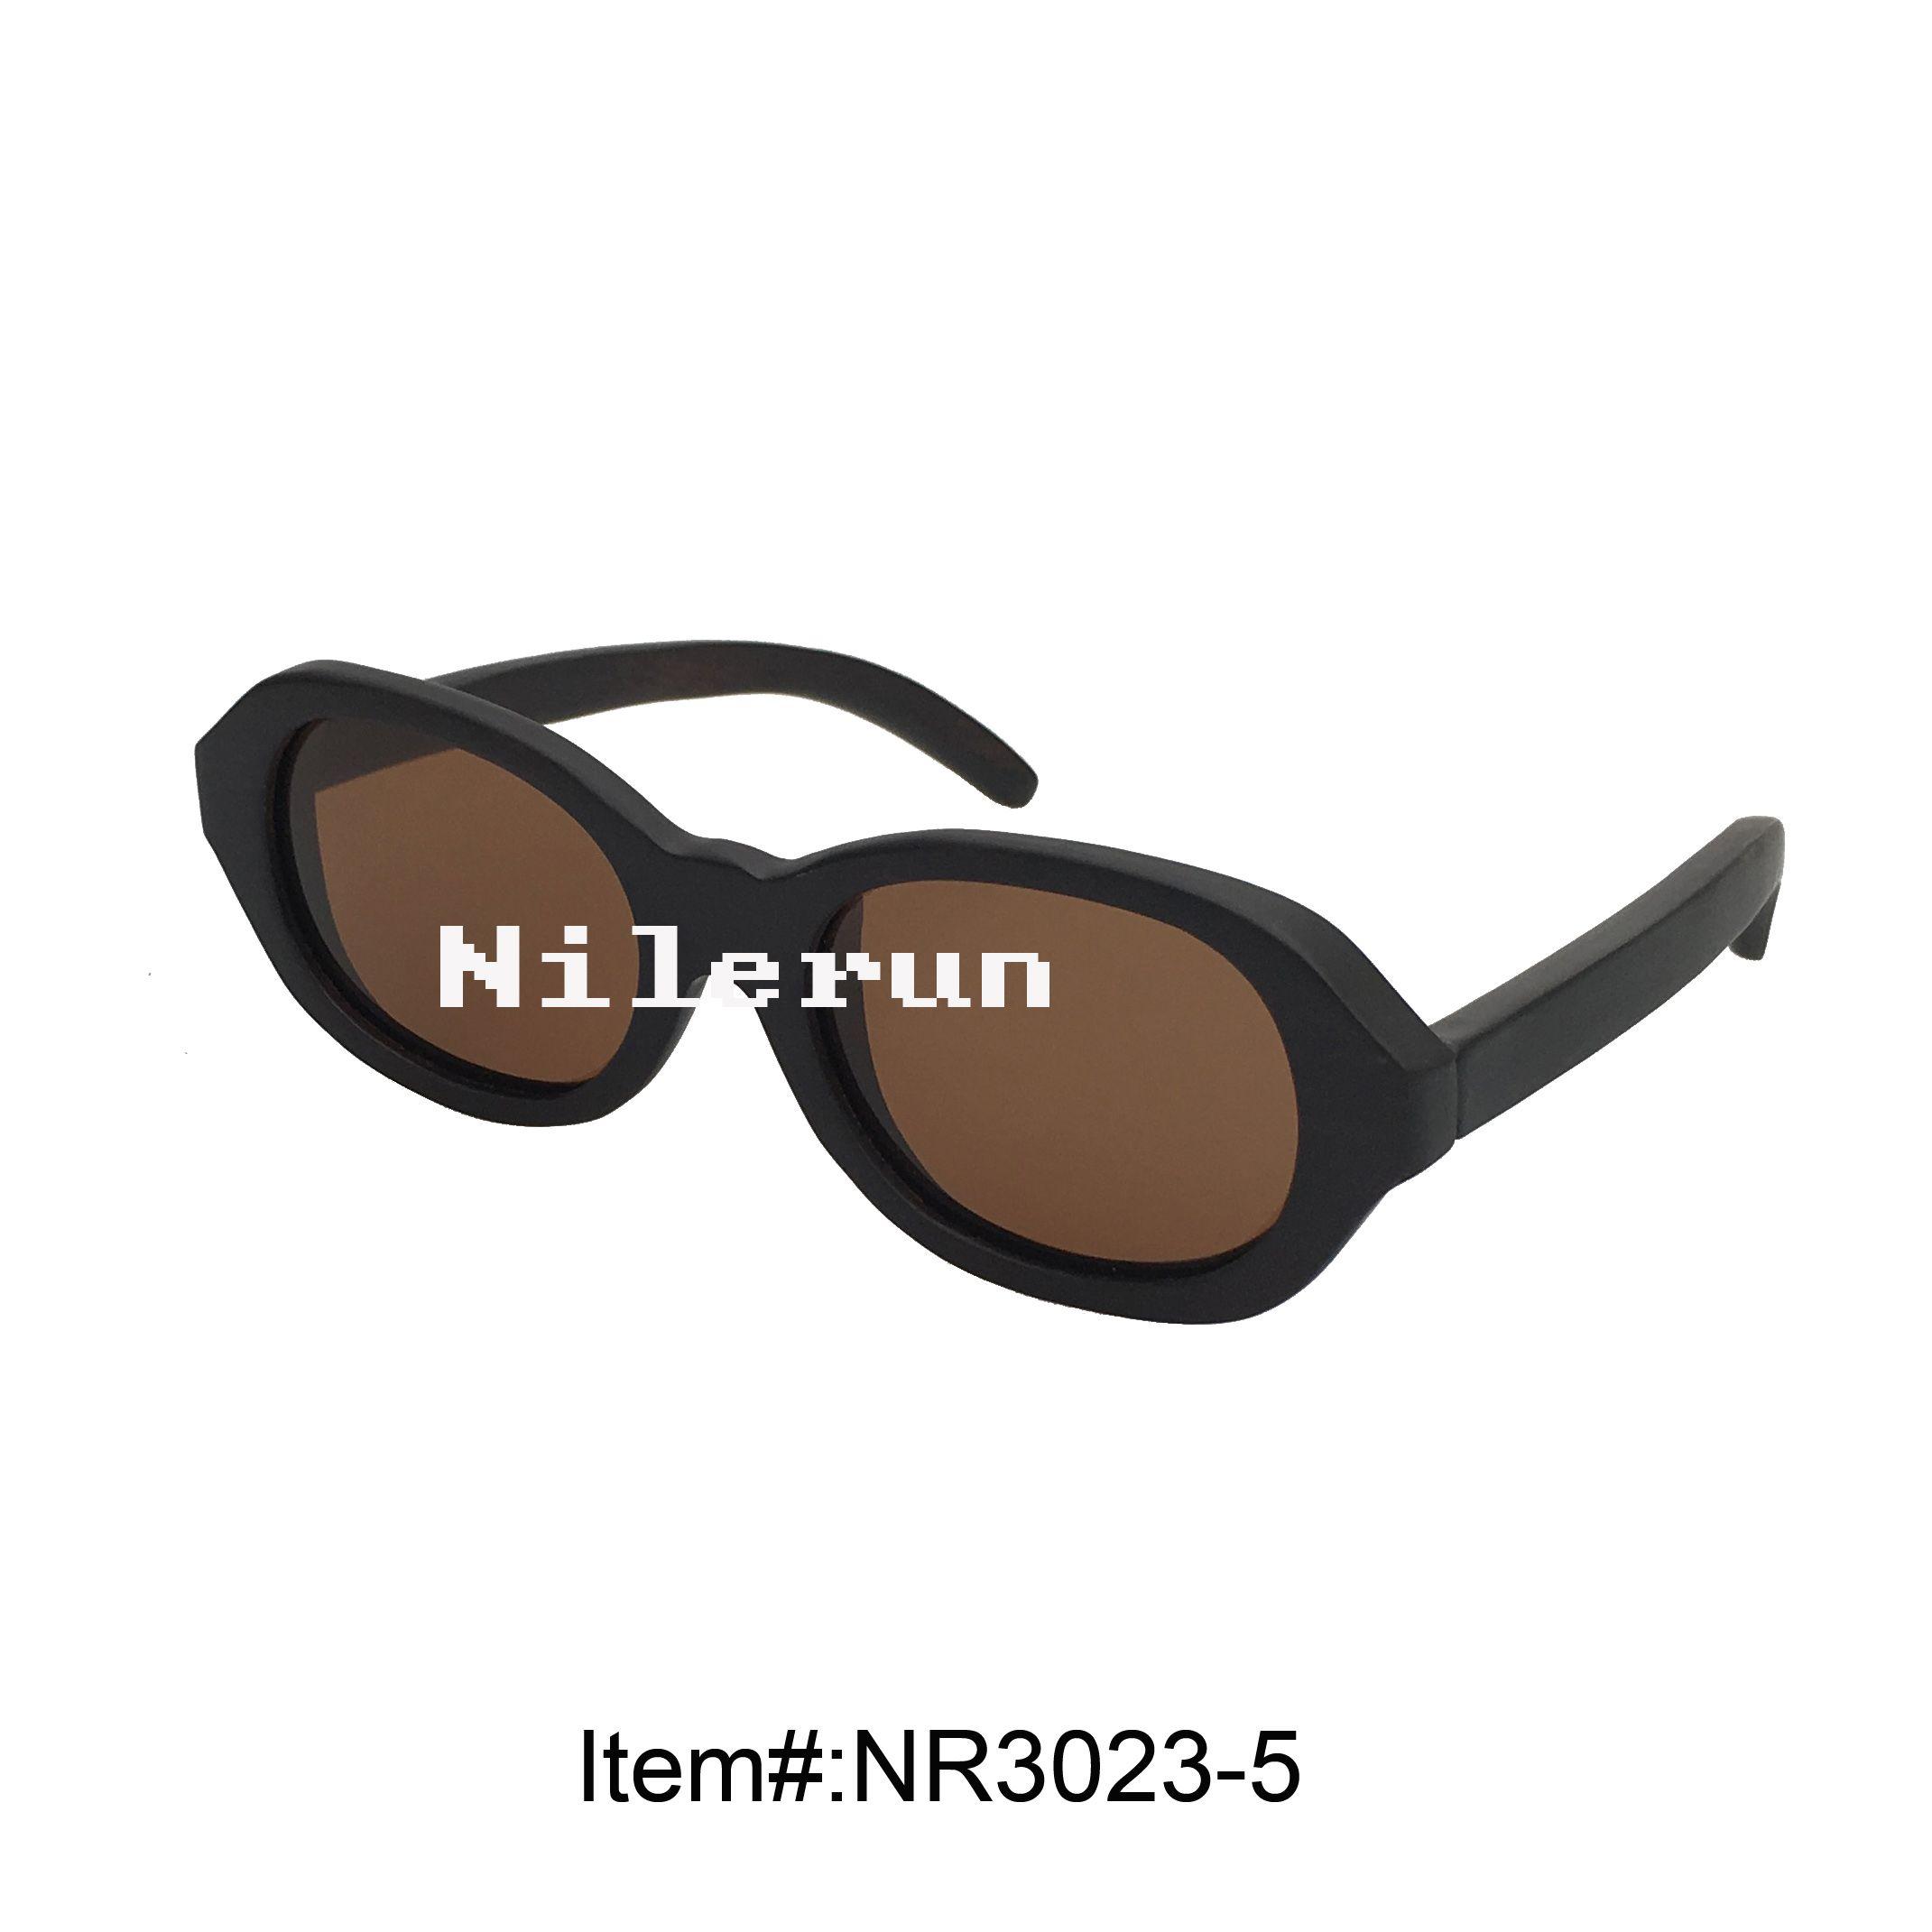 alte Mode aus Holz Sonnenbrillen